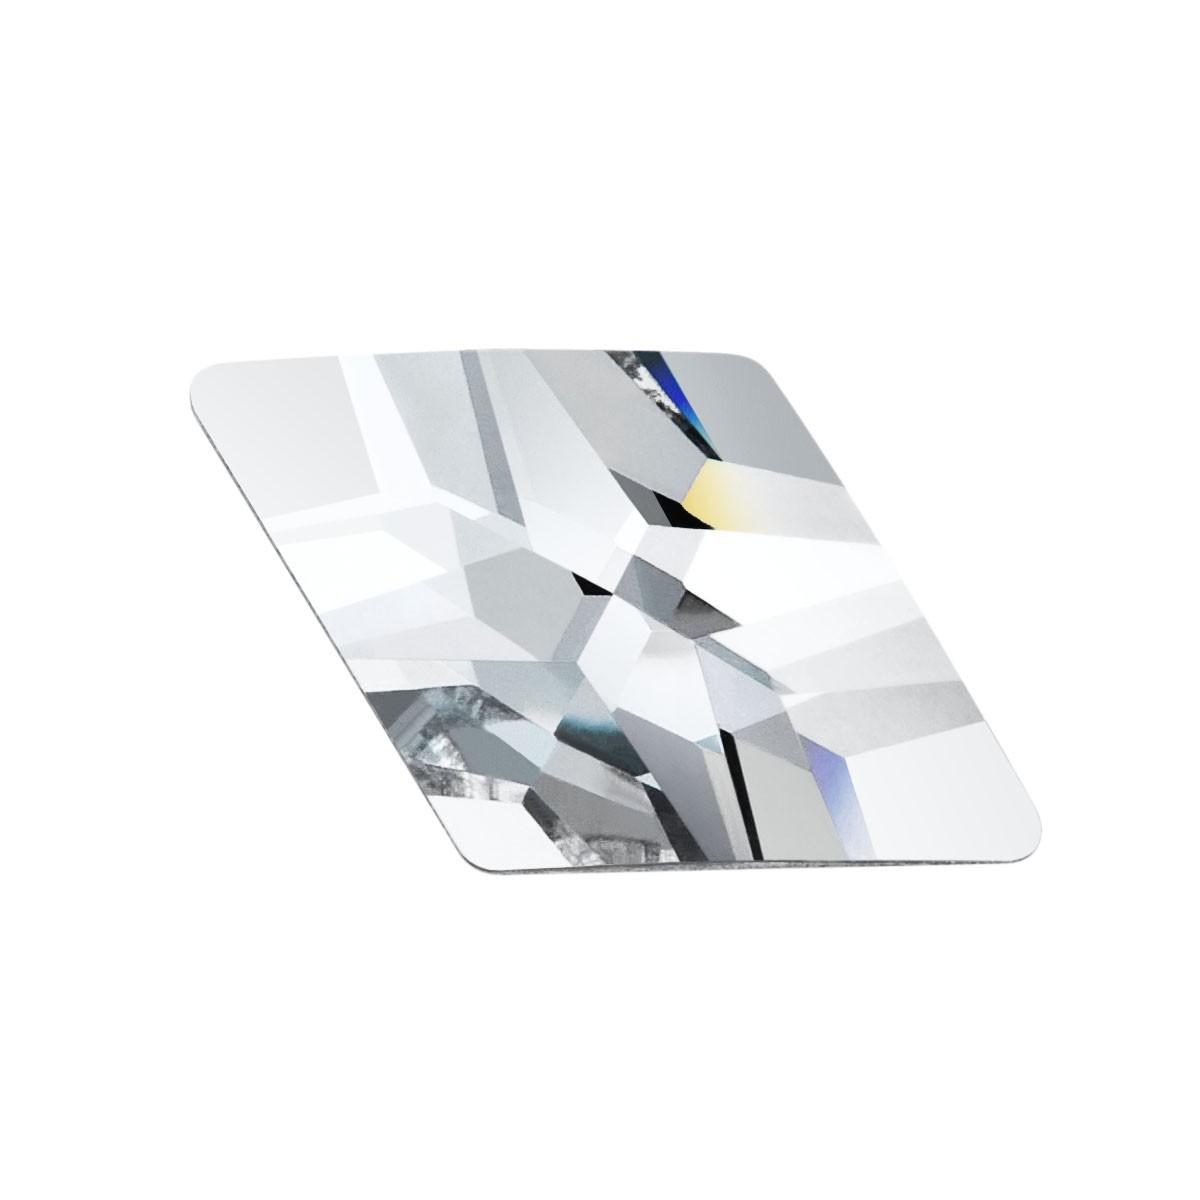 Rhombus Crystal 10 db 6x4